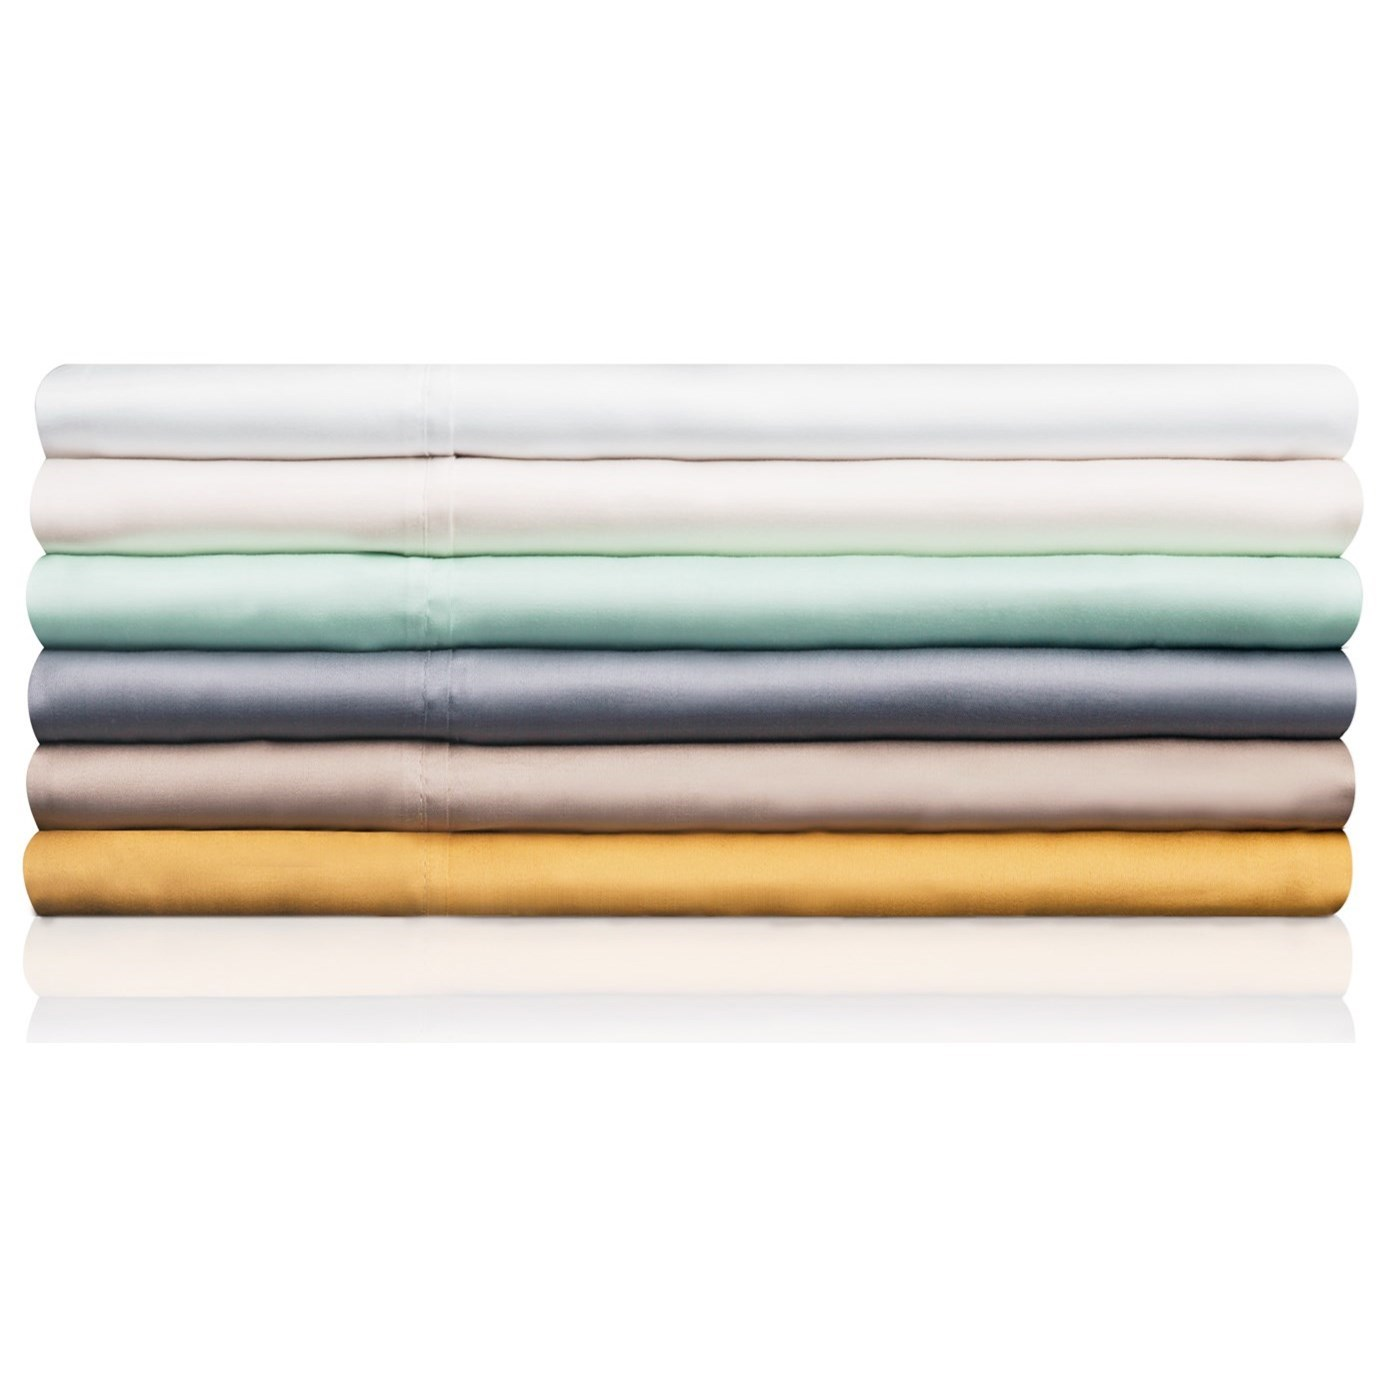 Malouf TENCEL® Full Woven™ TENCEL® Sheet Set - Item Number: MA03FFIVTS